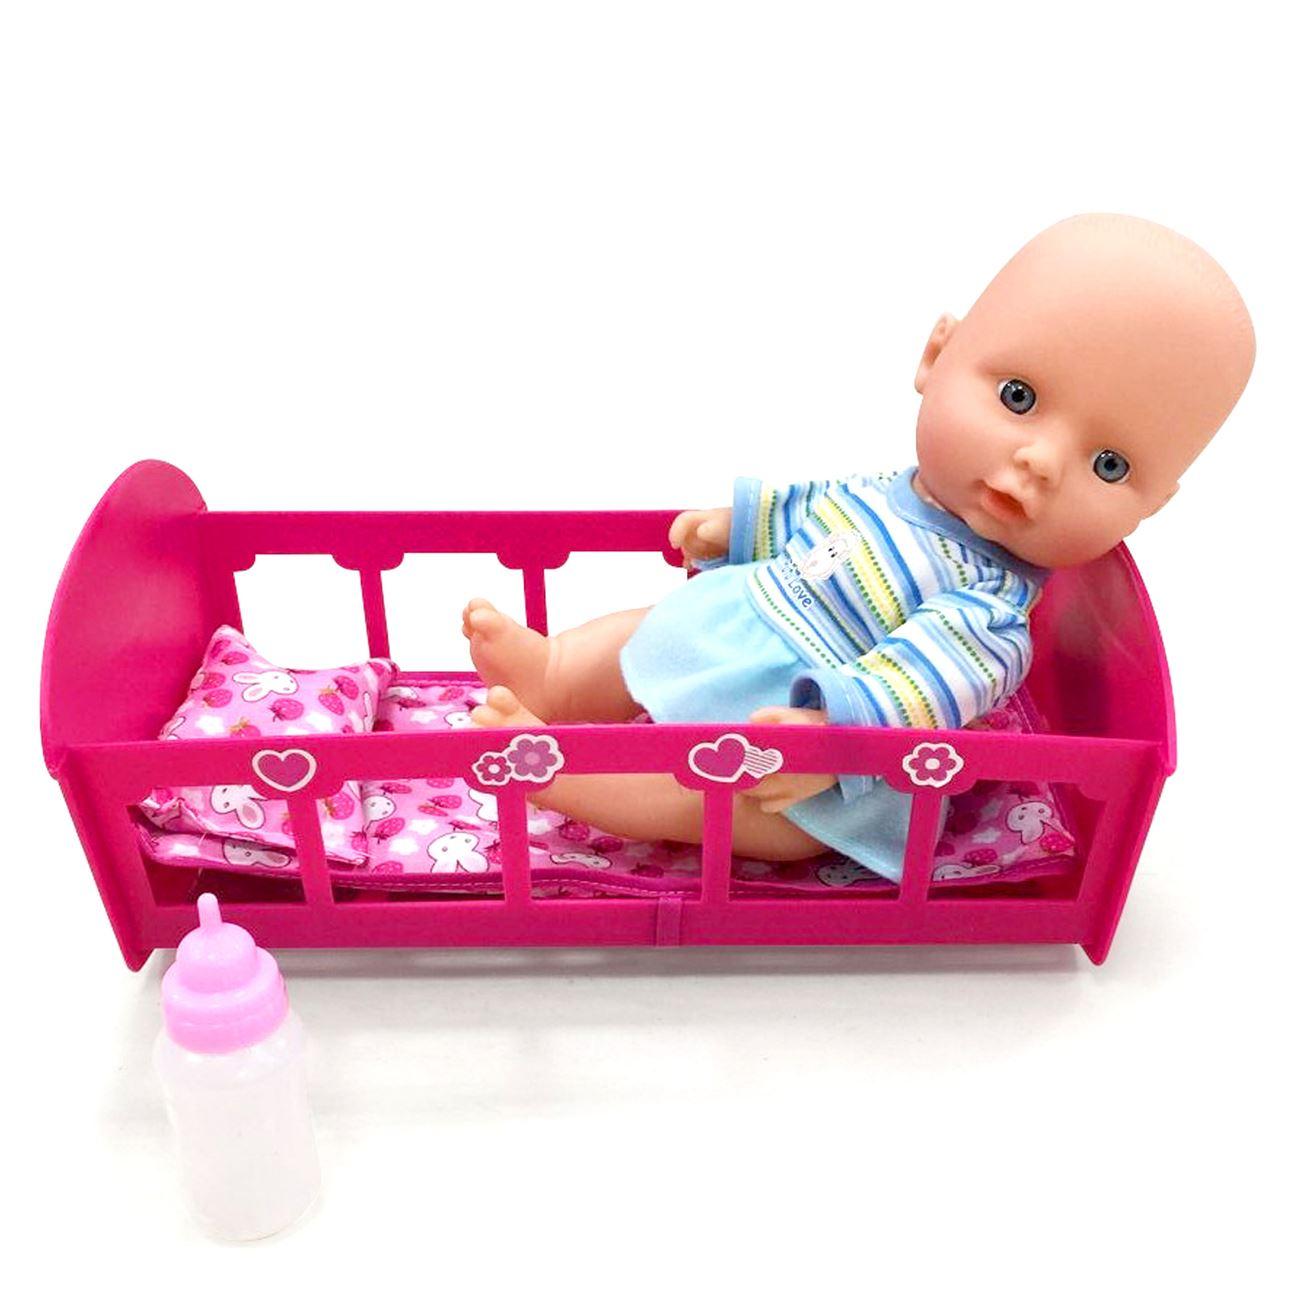 486aa5ce5d1 Μωρό Μπαταρίας, Κρεβάτι & Αξεσουάρ 30 εκ. < Σετ Μωρά | Jumbo